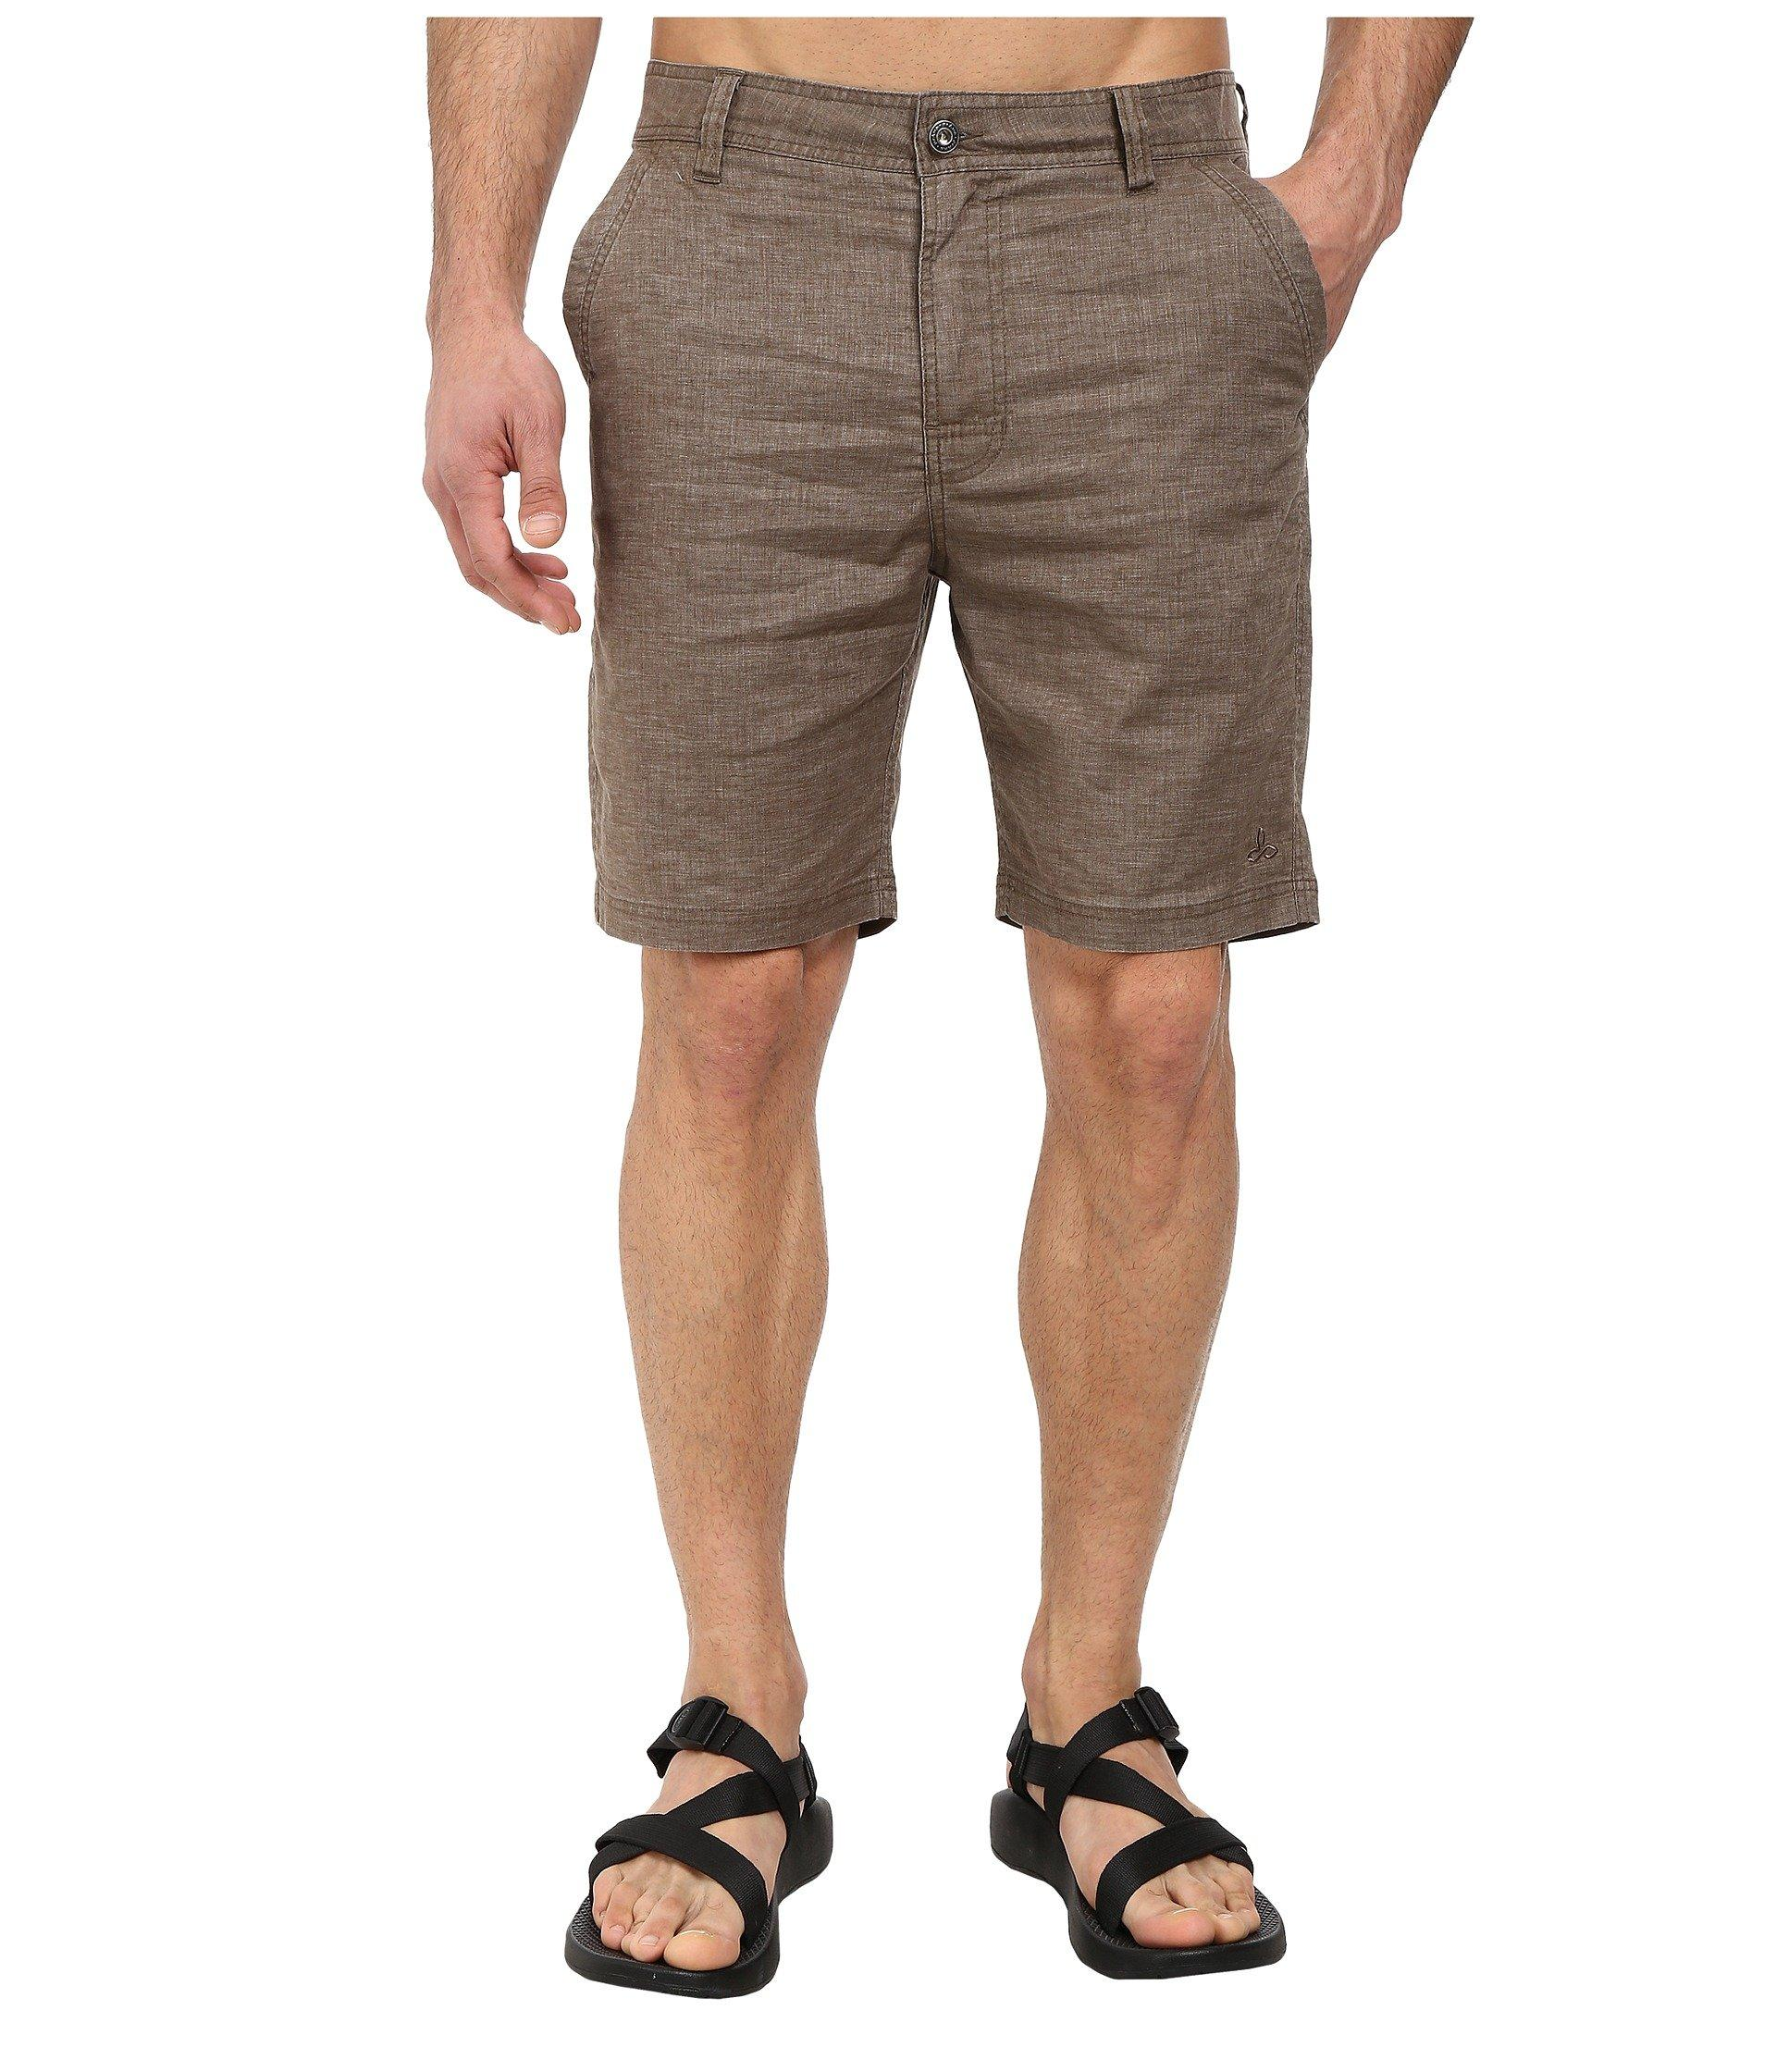 prAna Men/'s Bronson 11-Inch Inseam Shorts Mud Size 31 New